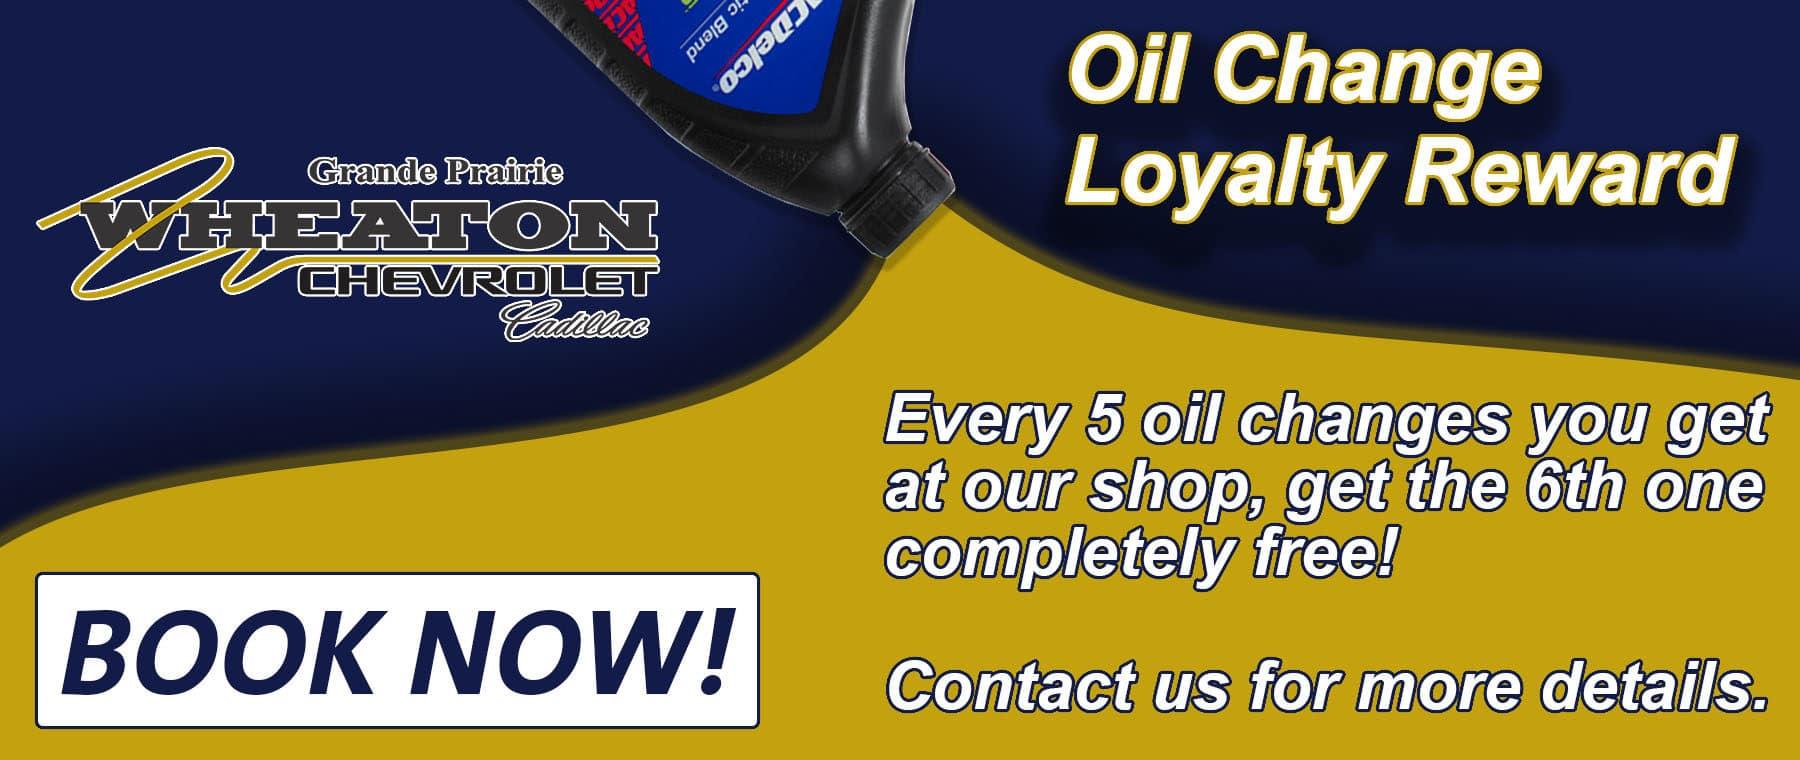 Oil CHange Loyalty